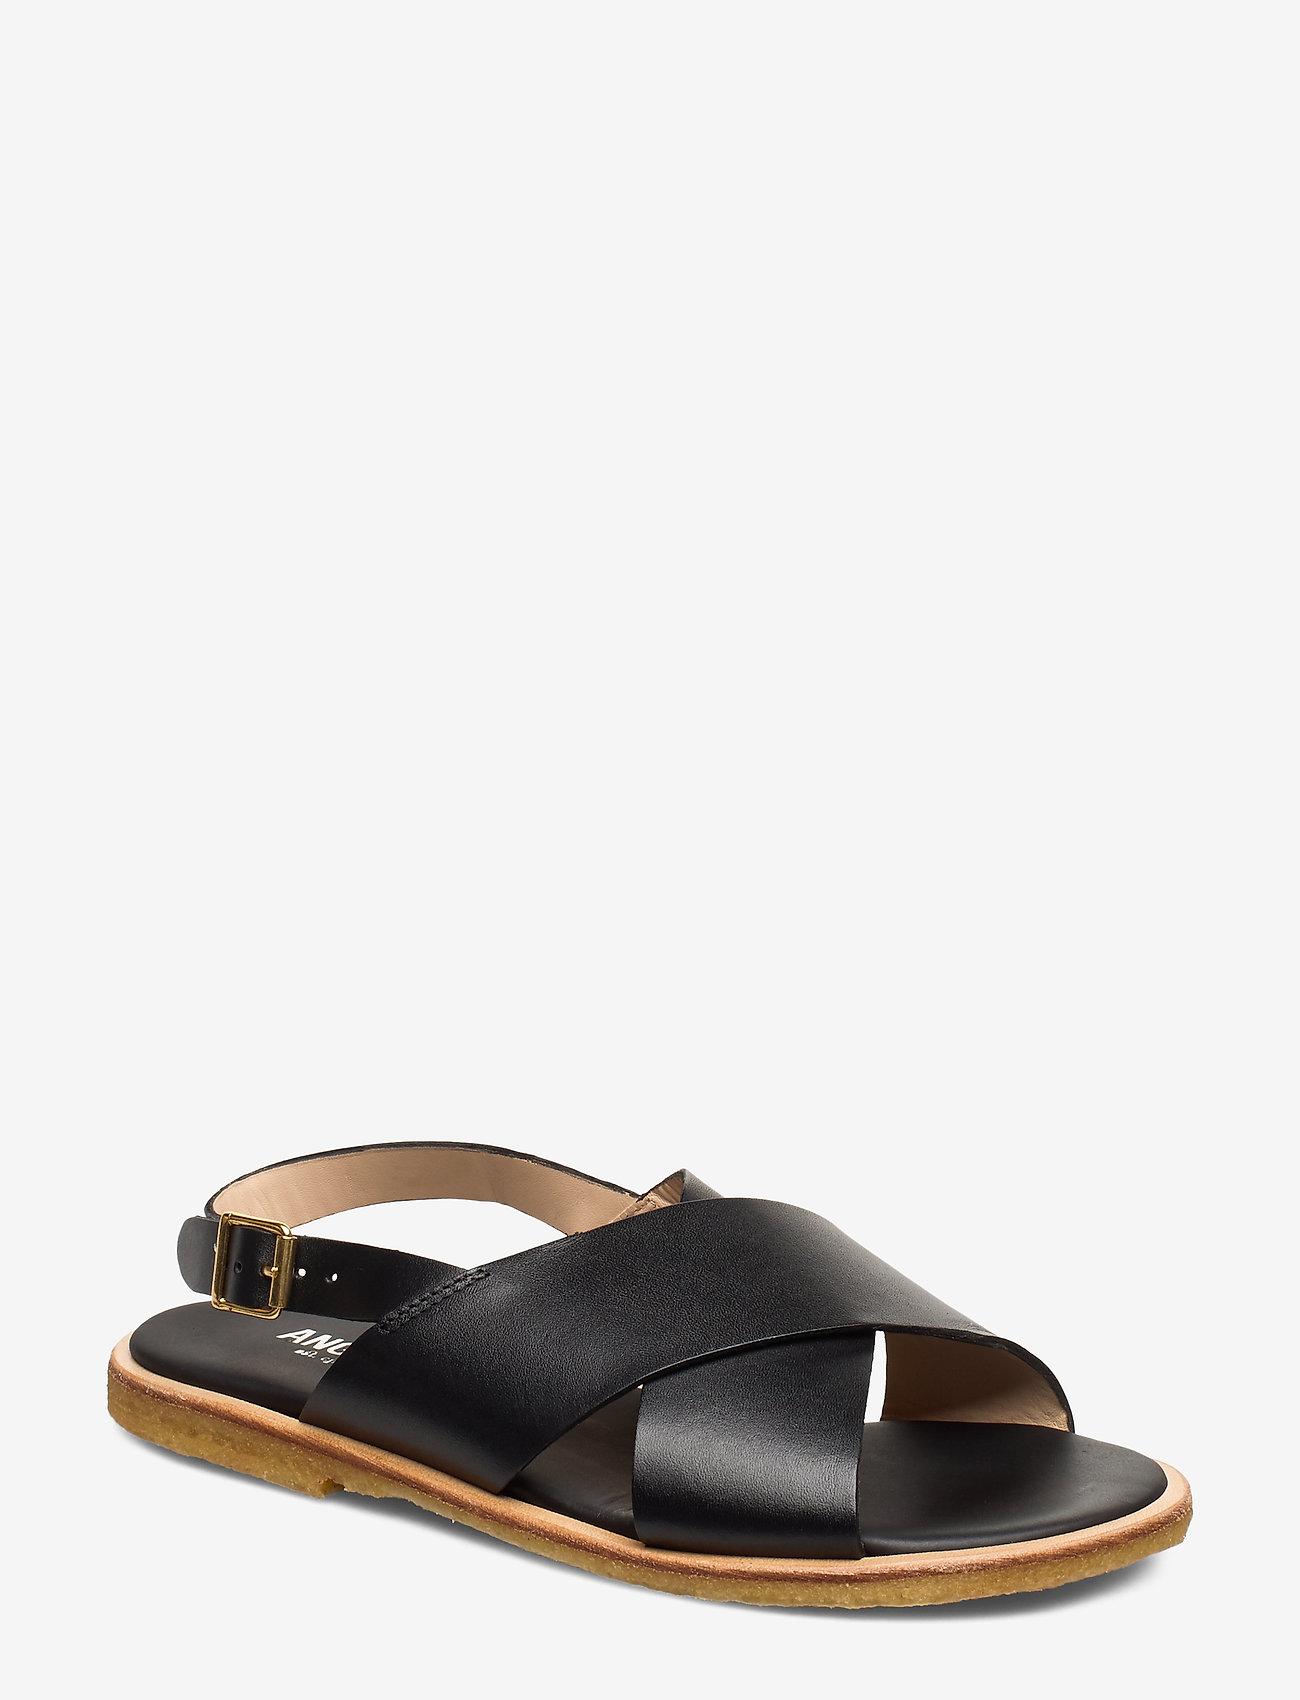 ANGULUS - Sandals - flat - open toe - op - flache sandalen - 1785 black - 0